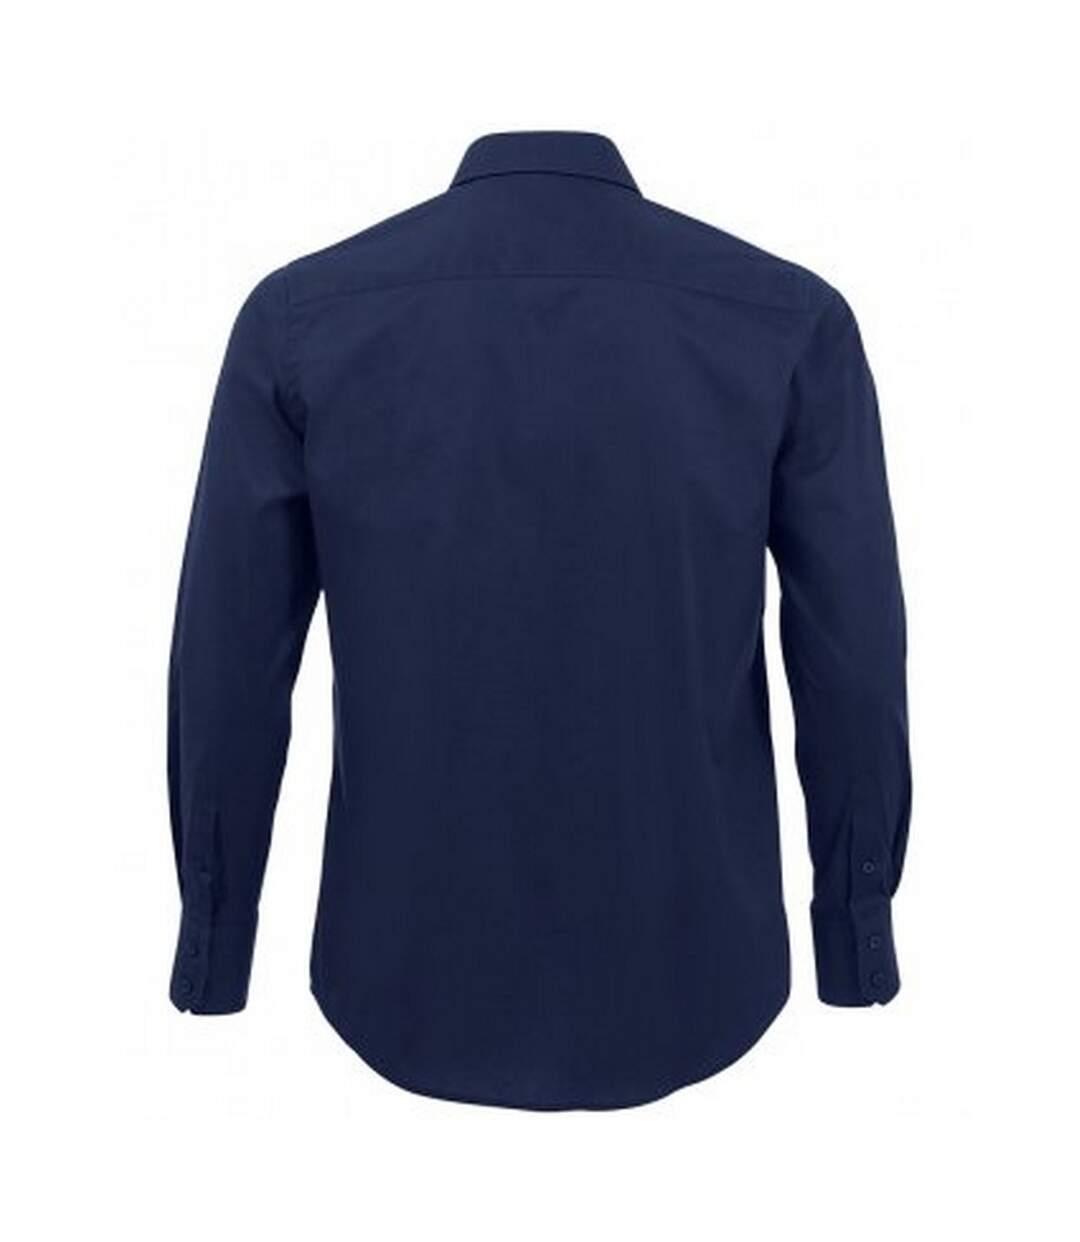 SOLS Mens Brighton Long Sleeve Fitted Work Shirt (Dark Blue) - UTPC337